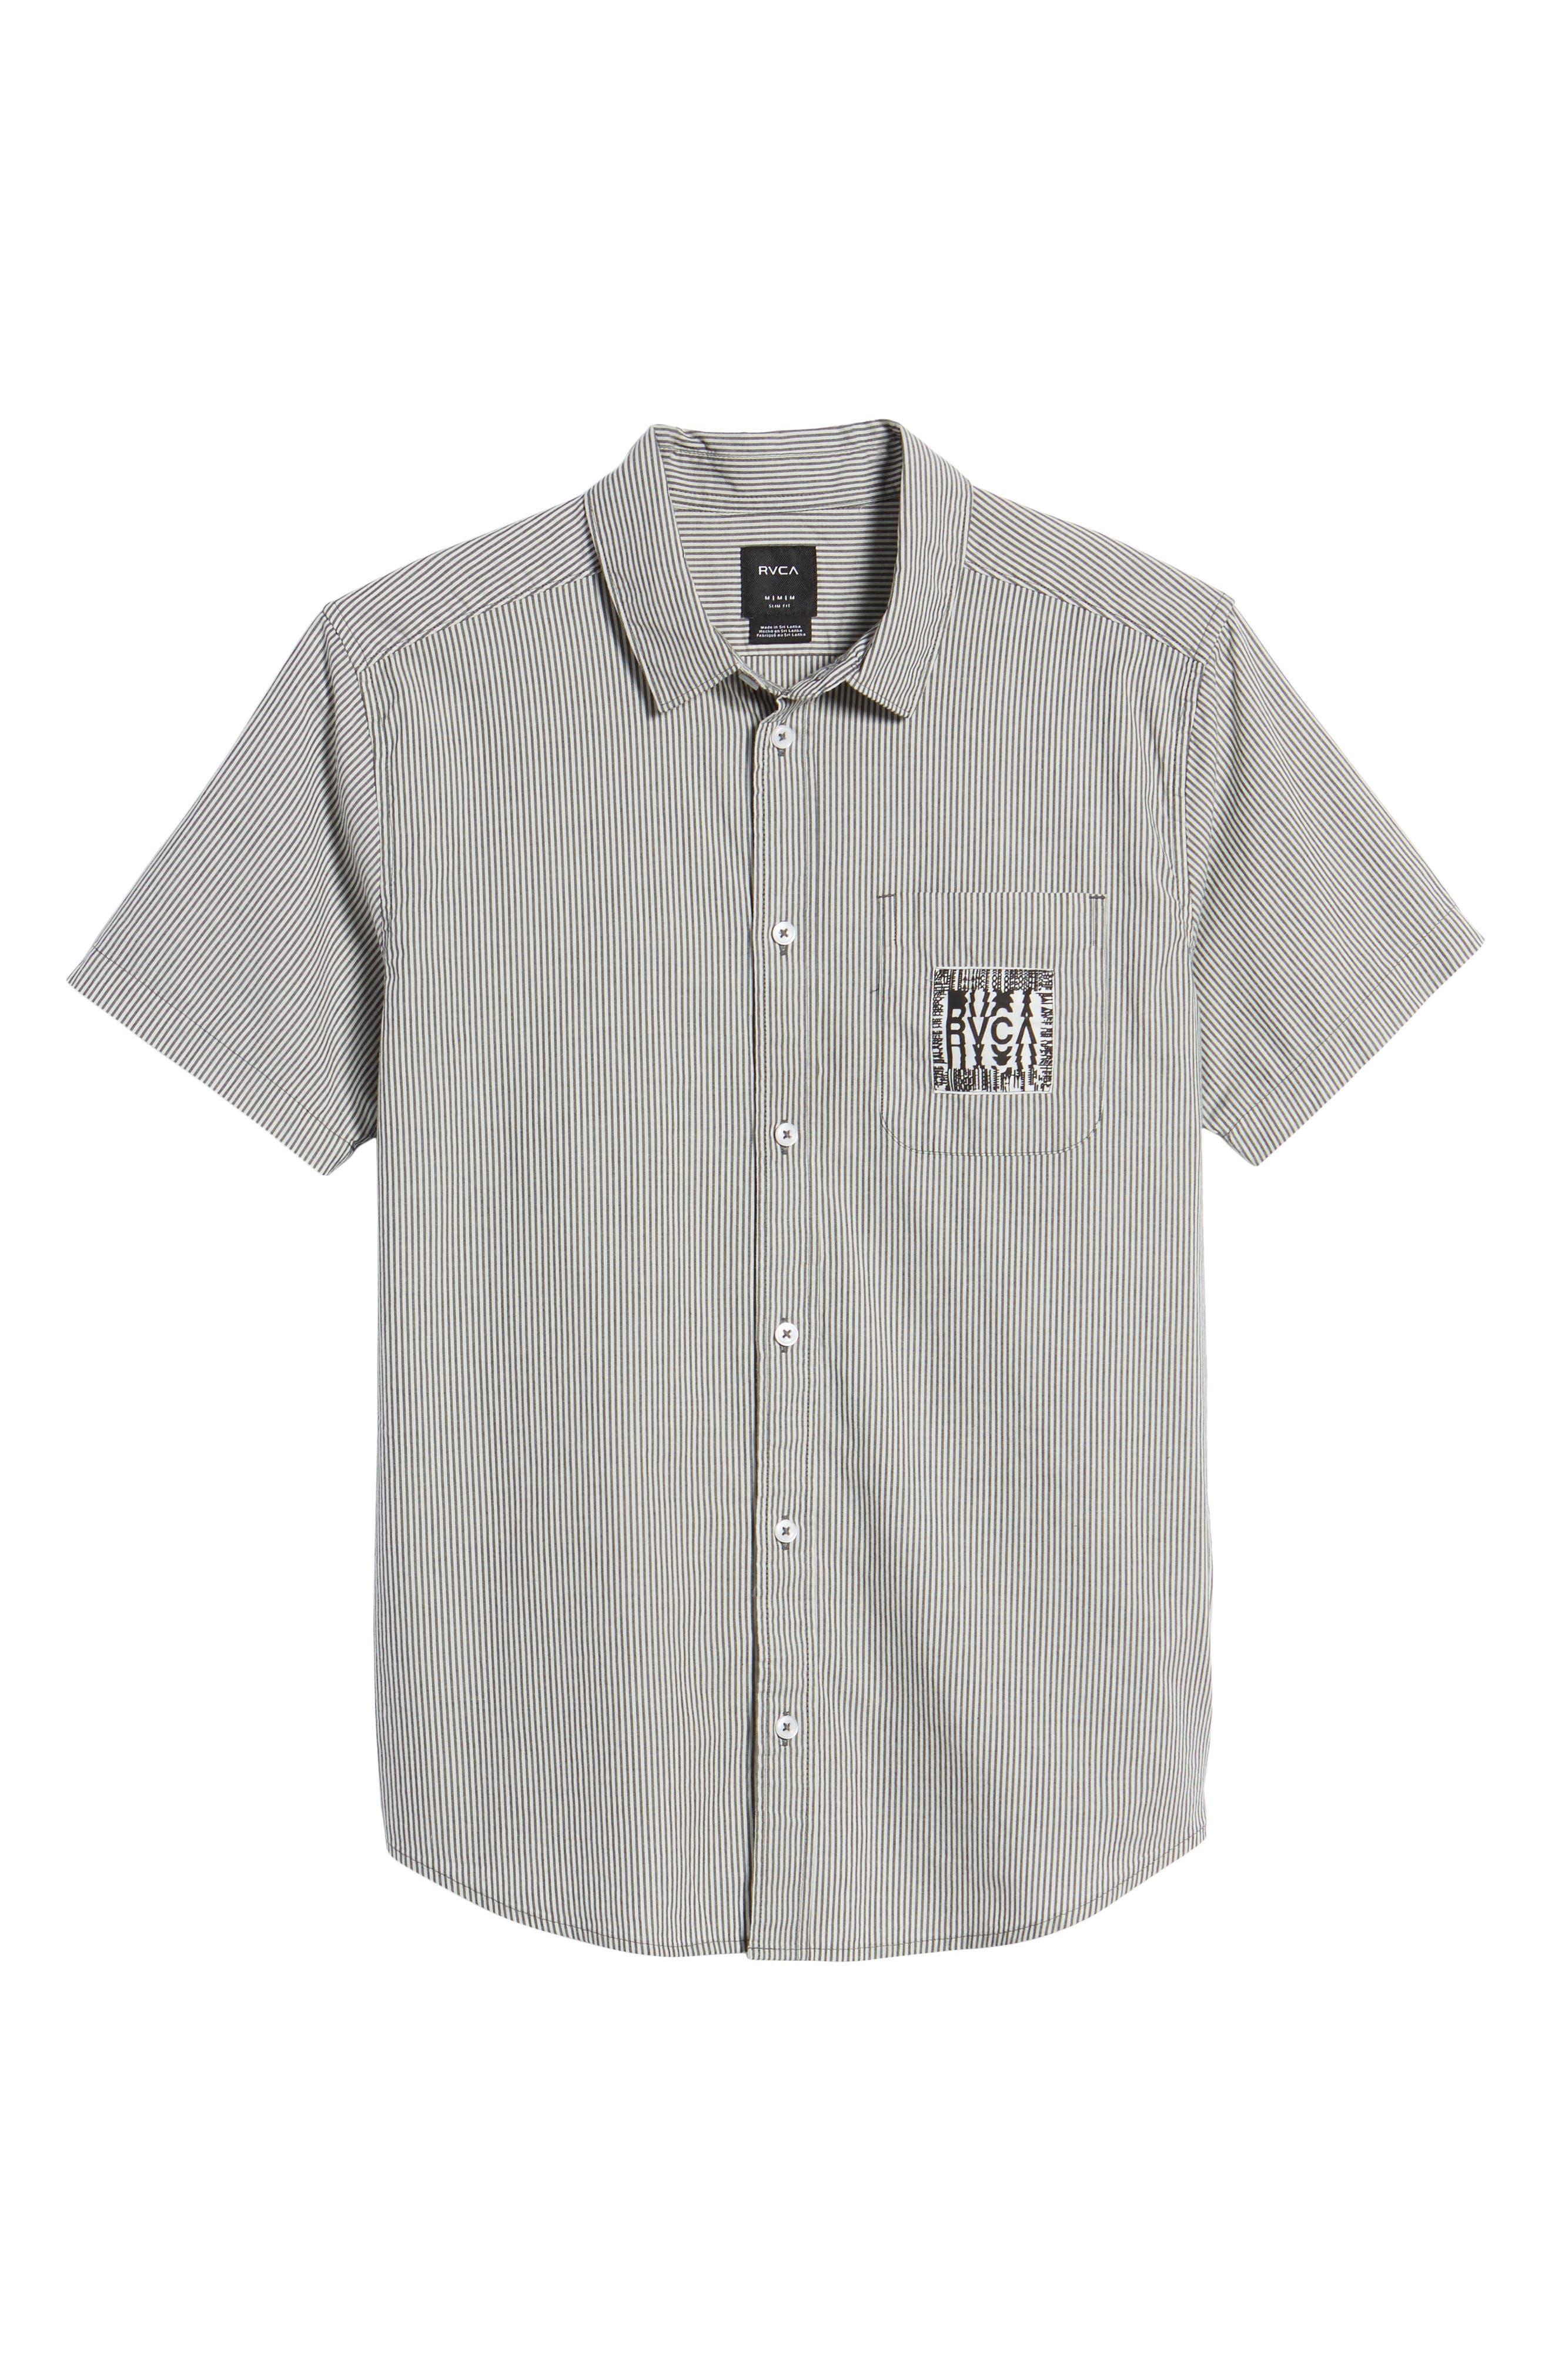 resort Disruption Woven Shirt,                             Alternate thumbnail 6, color,                             001